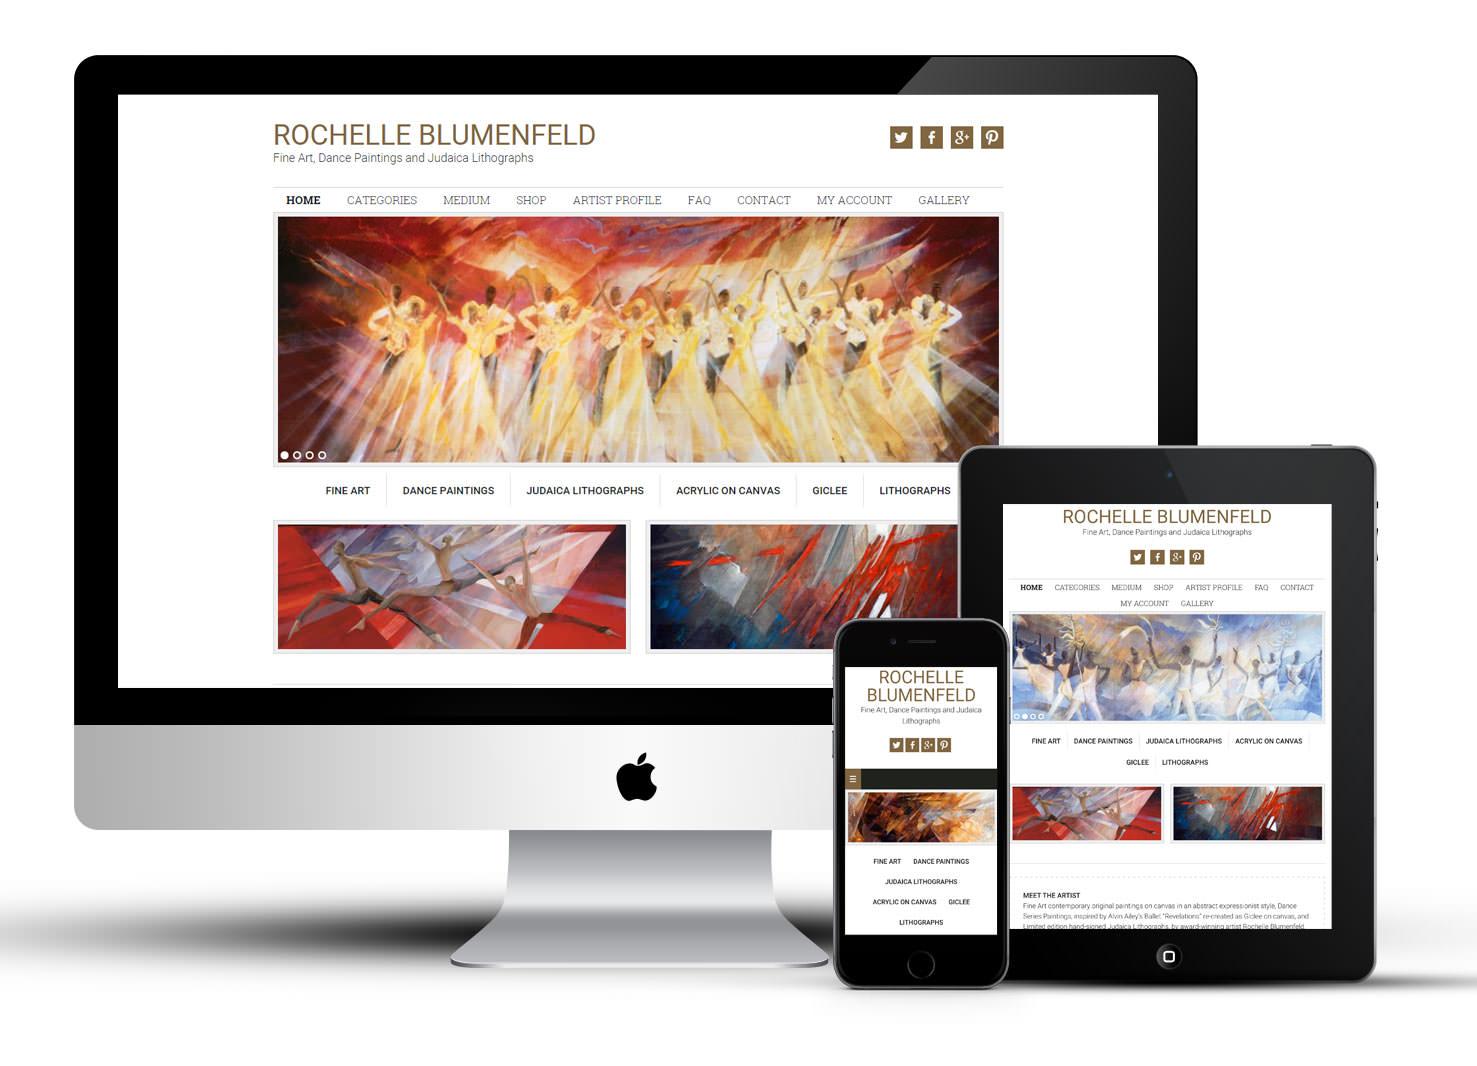 Mobile responsive website for an Artist